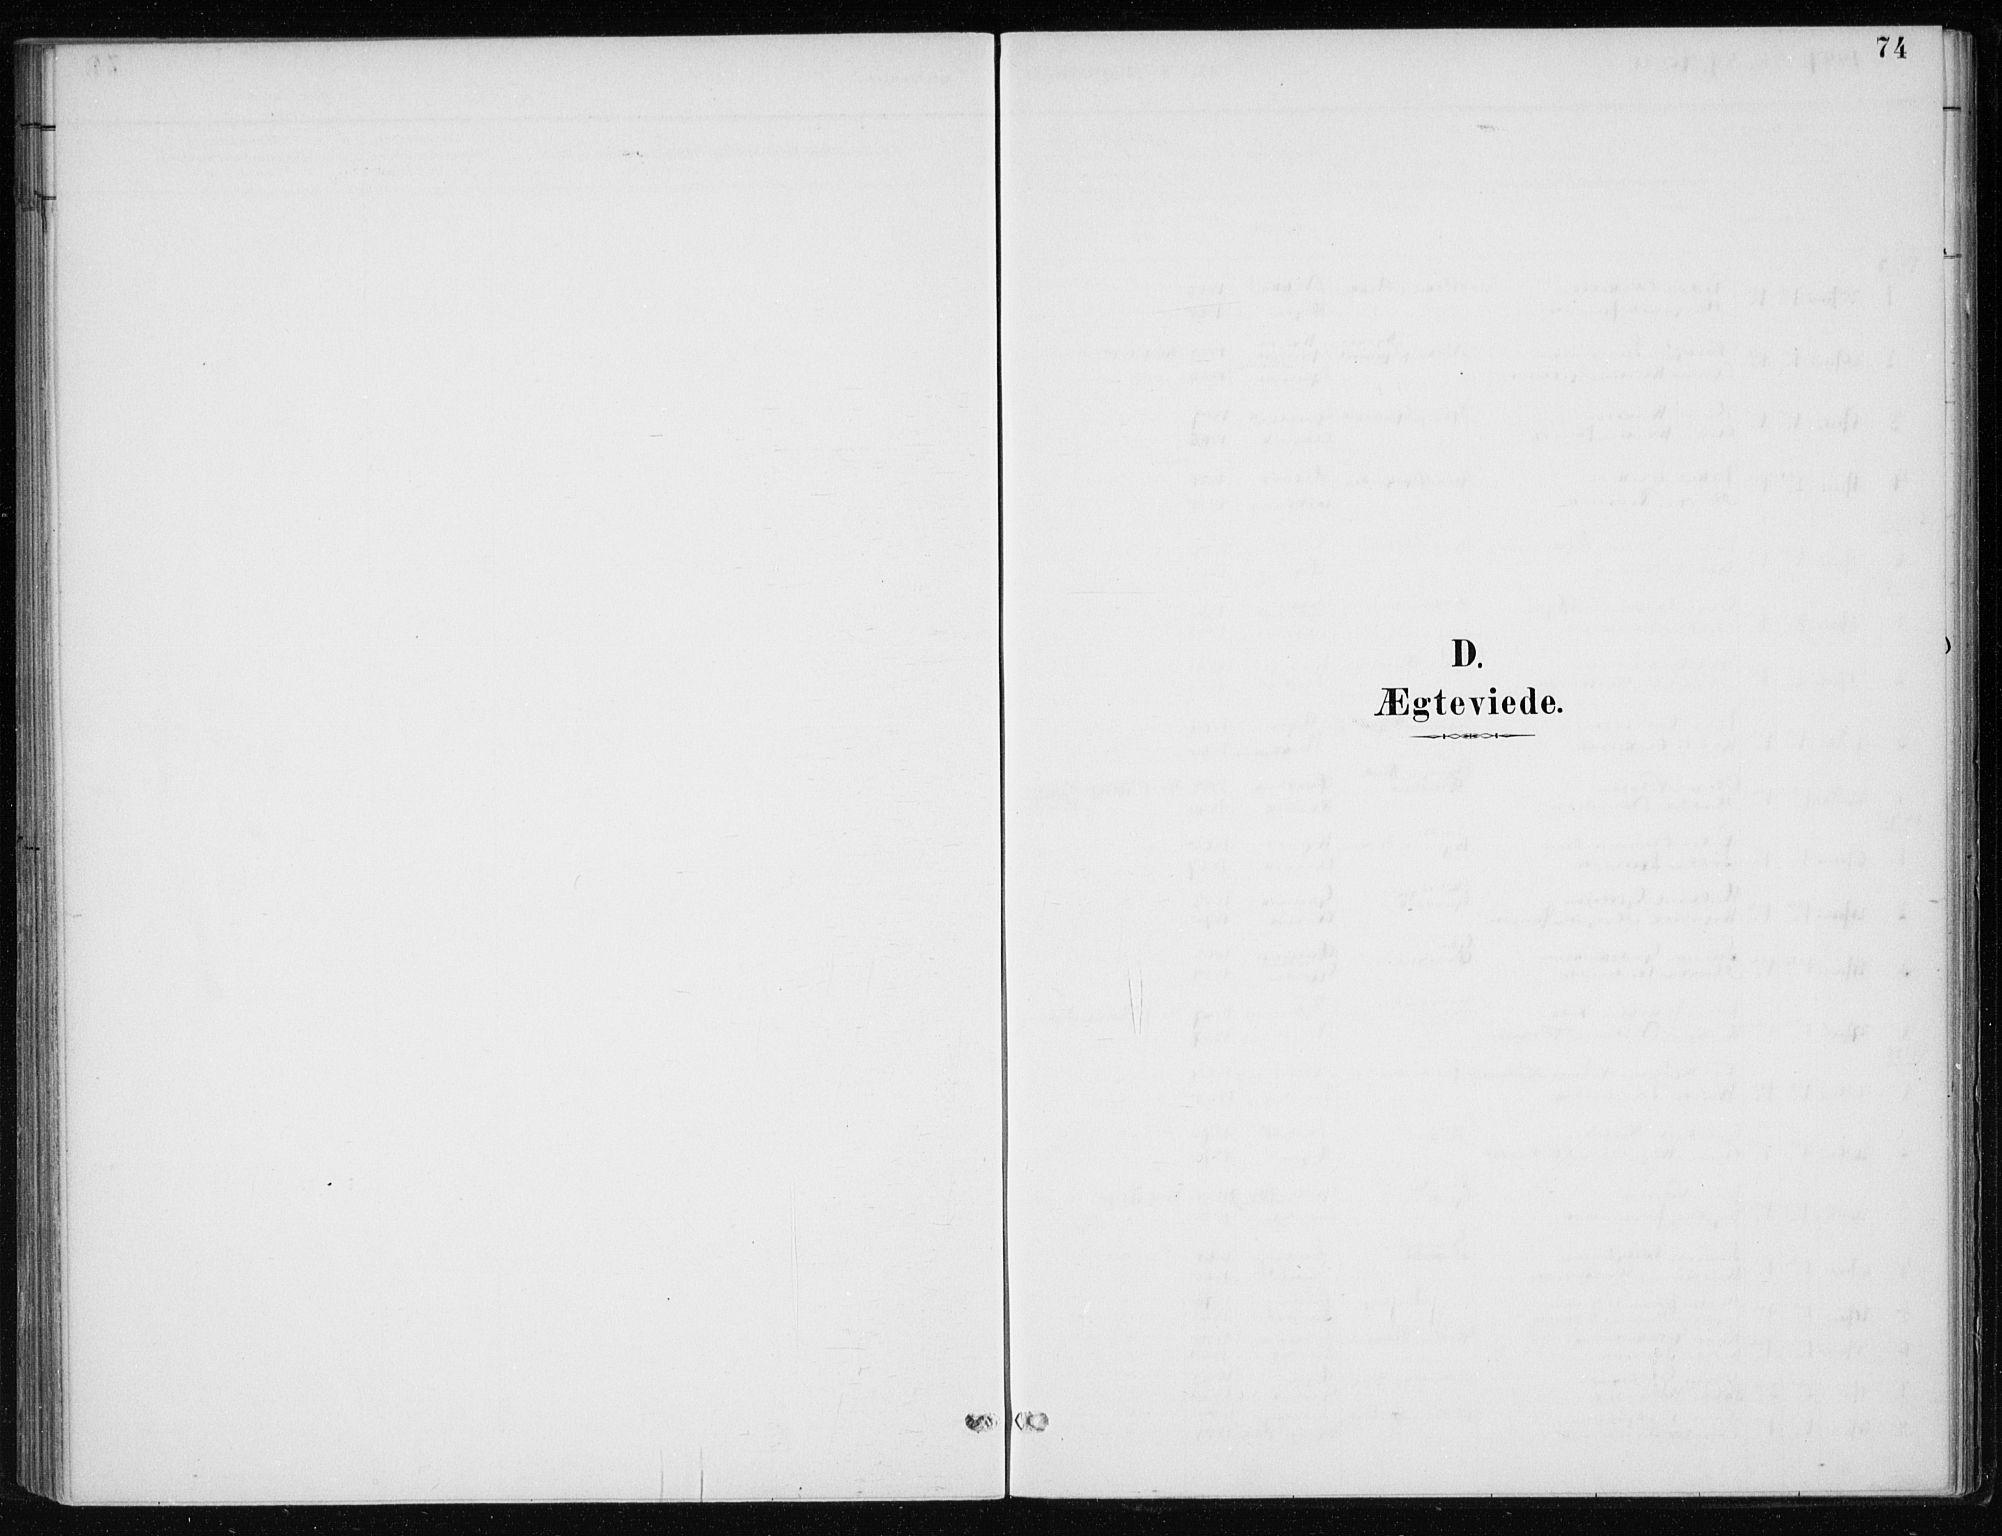 SAB, Kvinnherad Sokneprestembete, H/Haa: Parish register (official) no. F 1, 1887-1912, p. 74